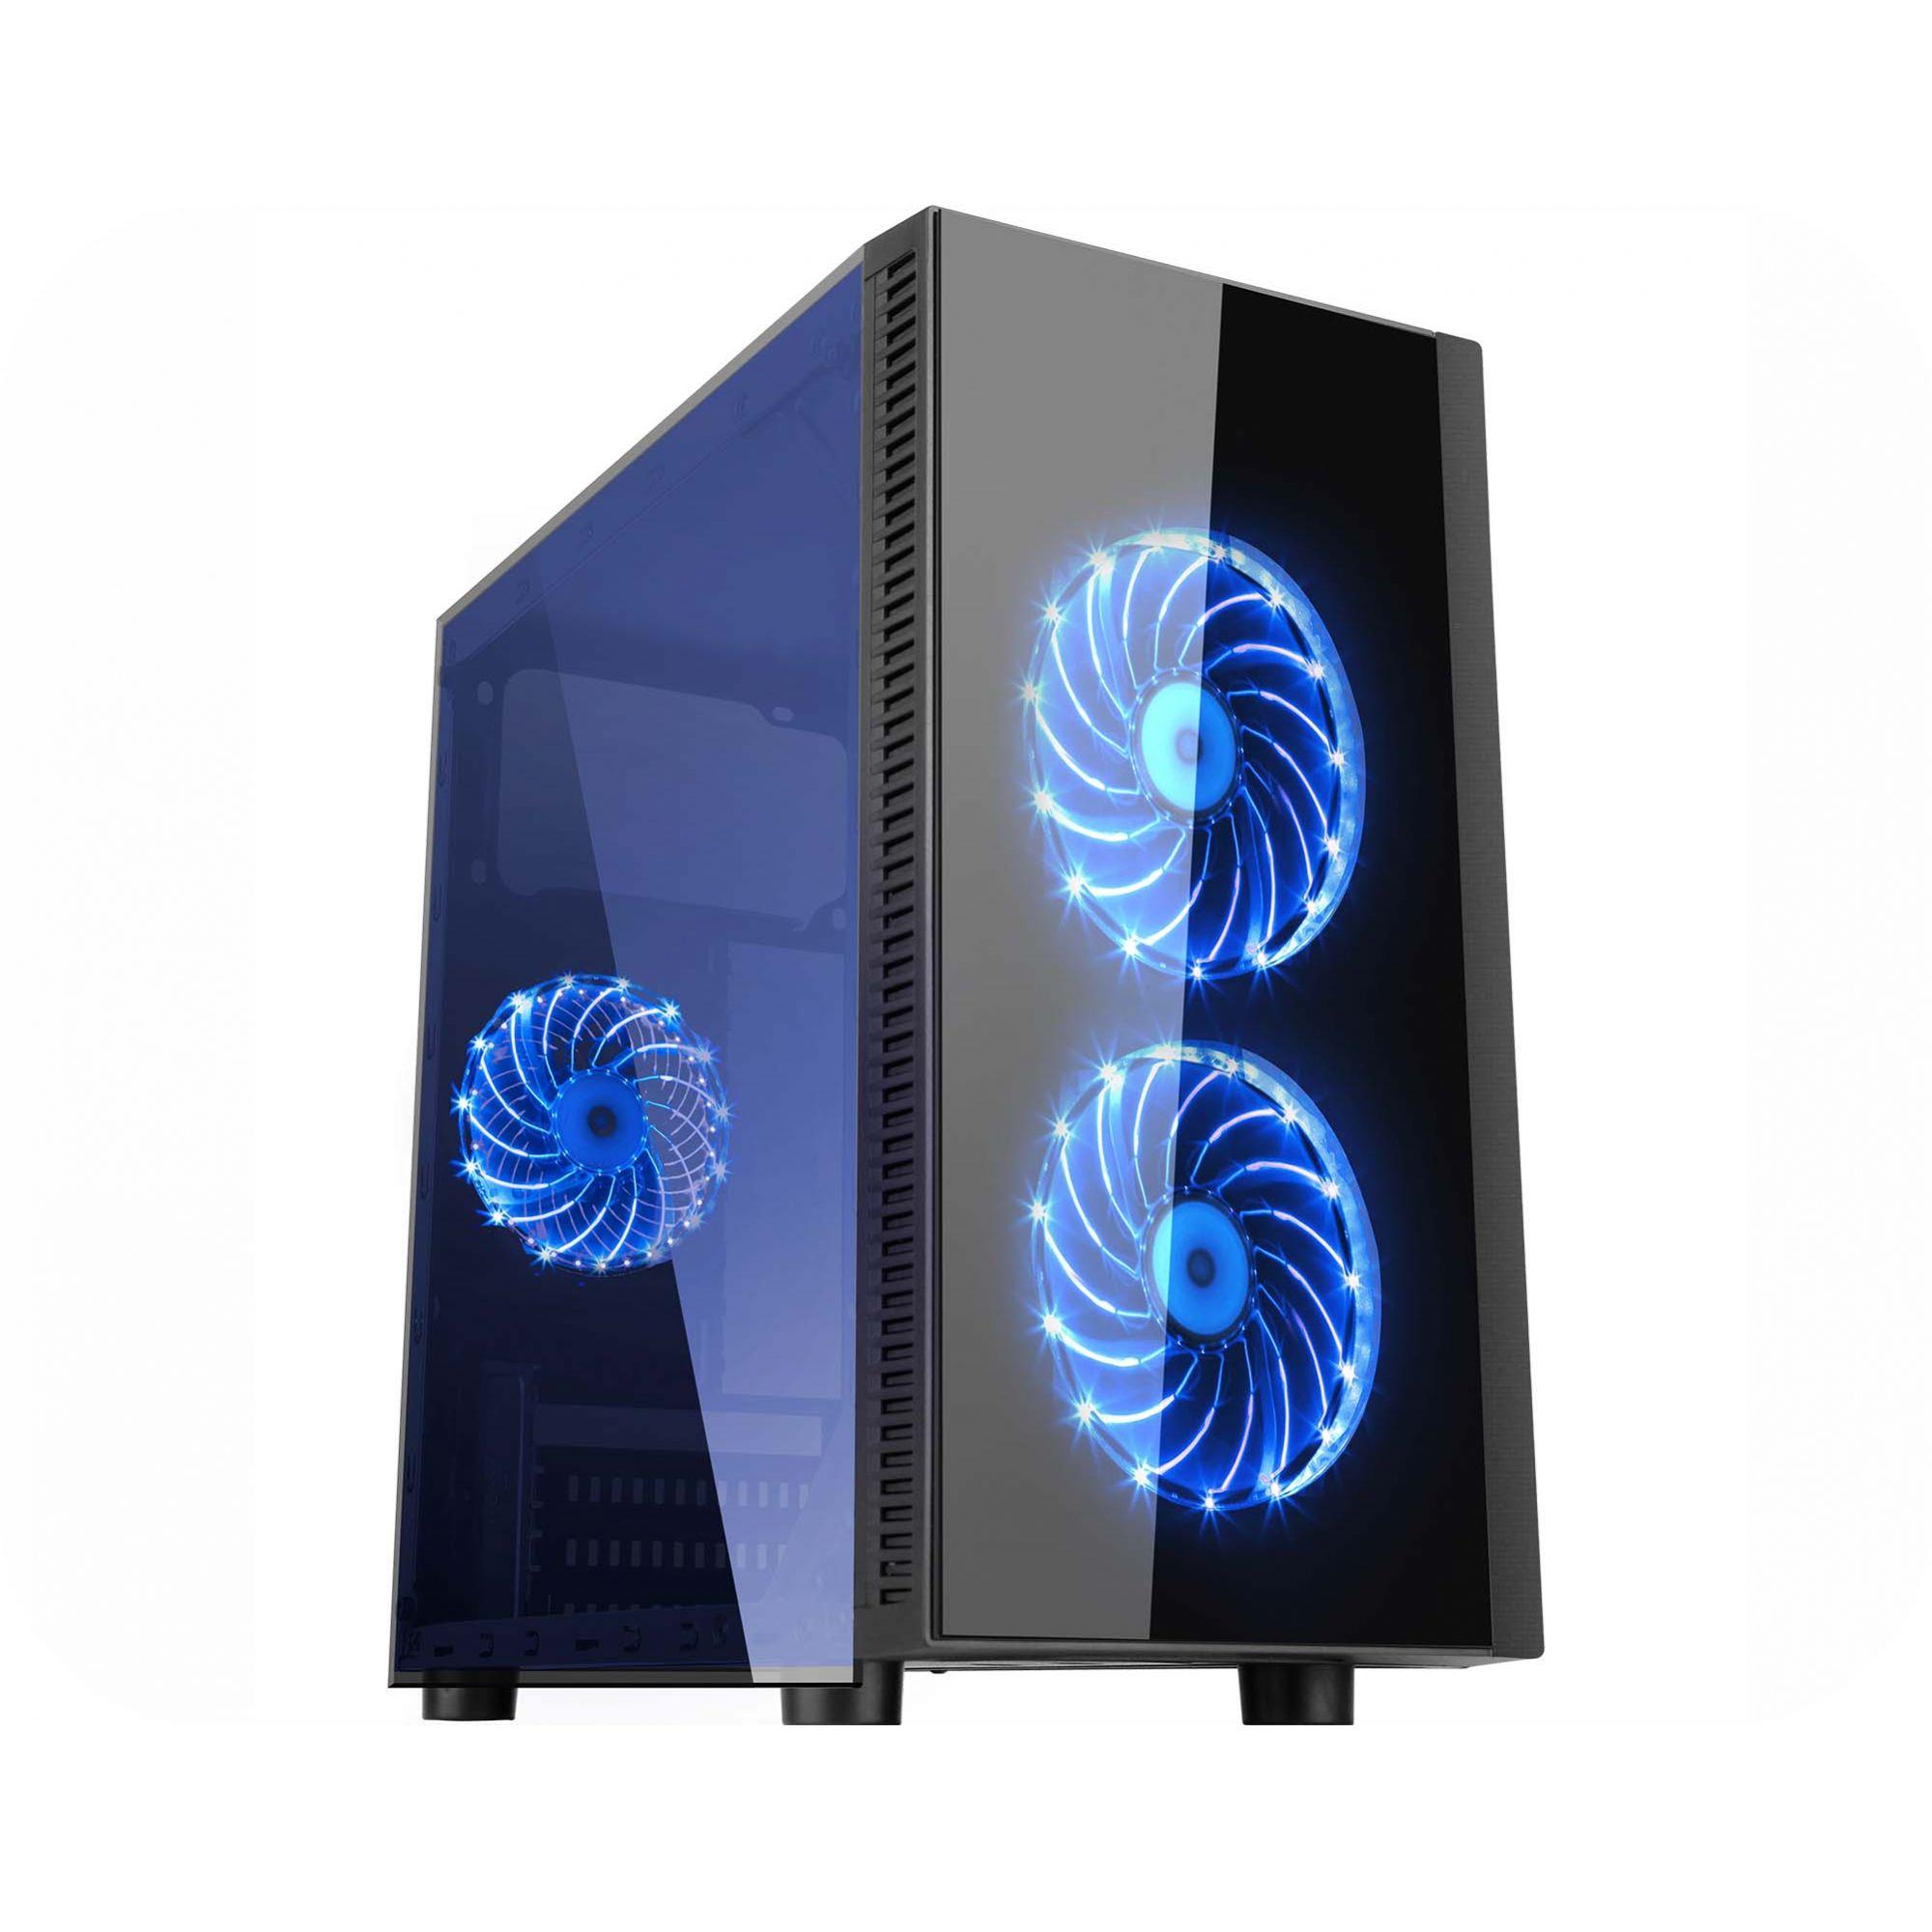 Computador Gamer Intel Core i5 - Memória 8GB, HD 1TB, Placa de Vídeo GTX1050TI 4GB, Fonte 500W Real, Gabinete Narnia